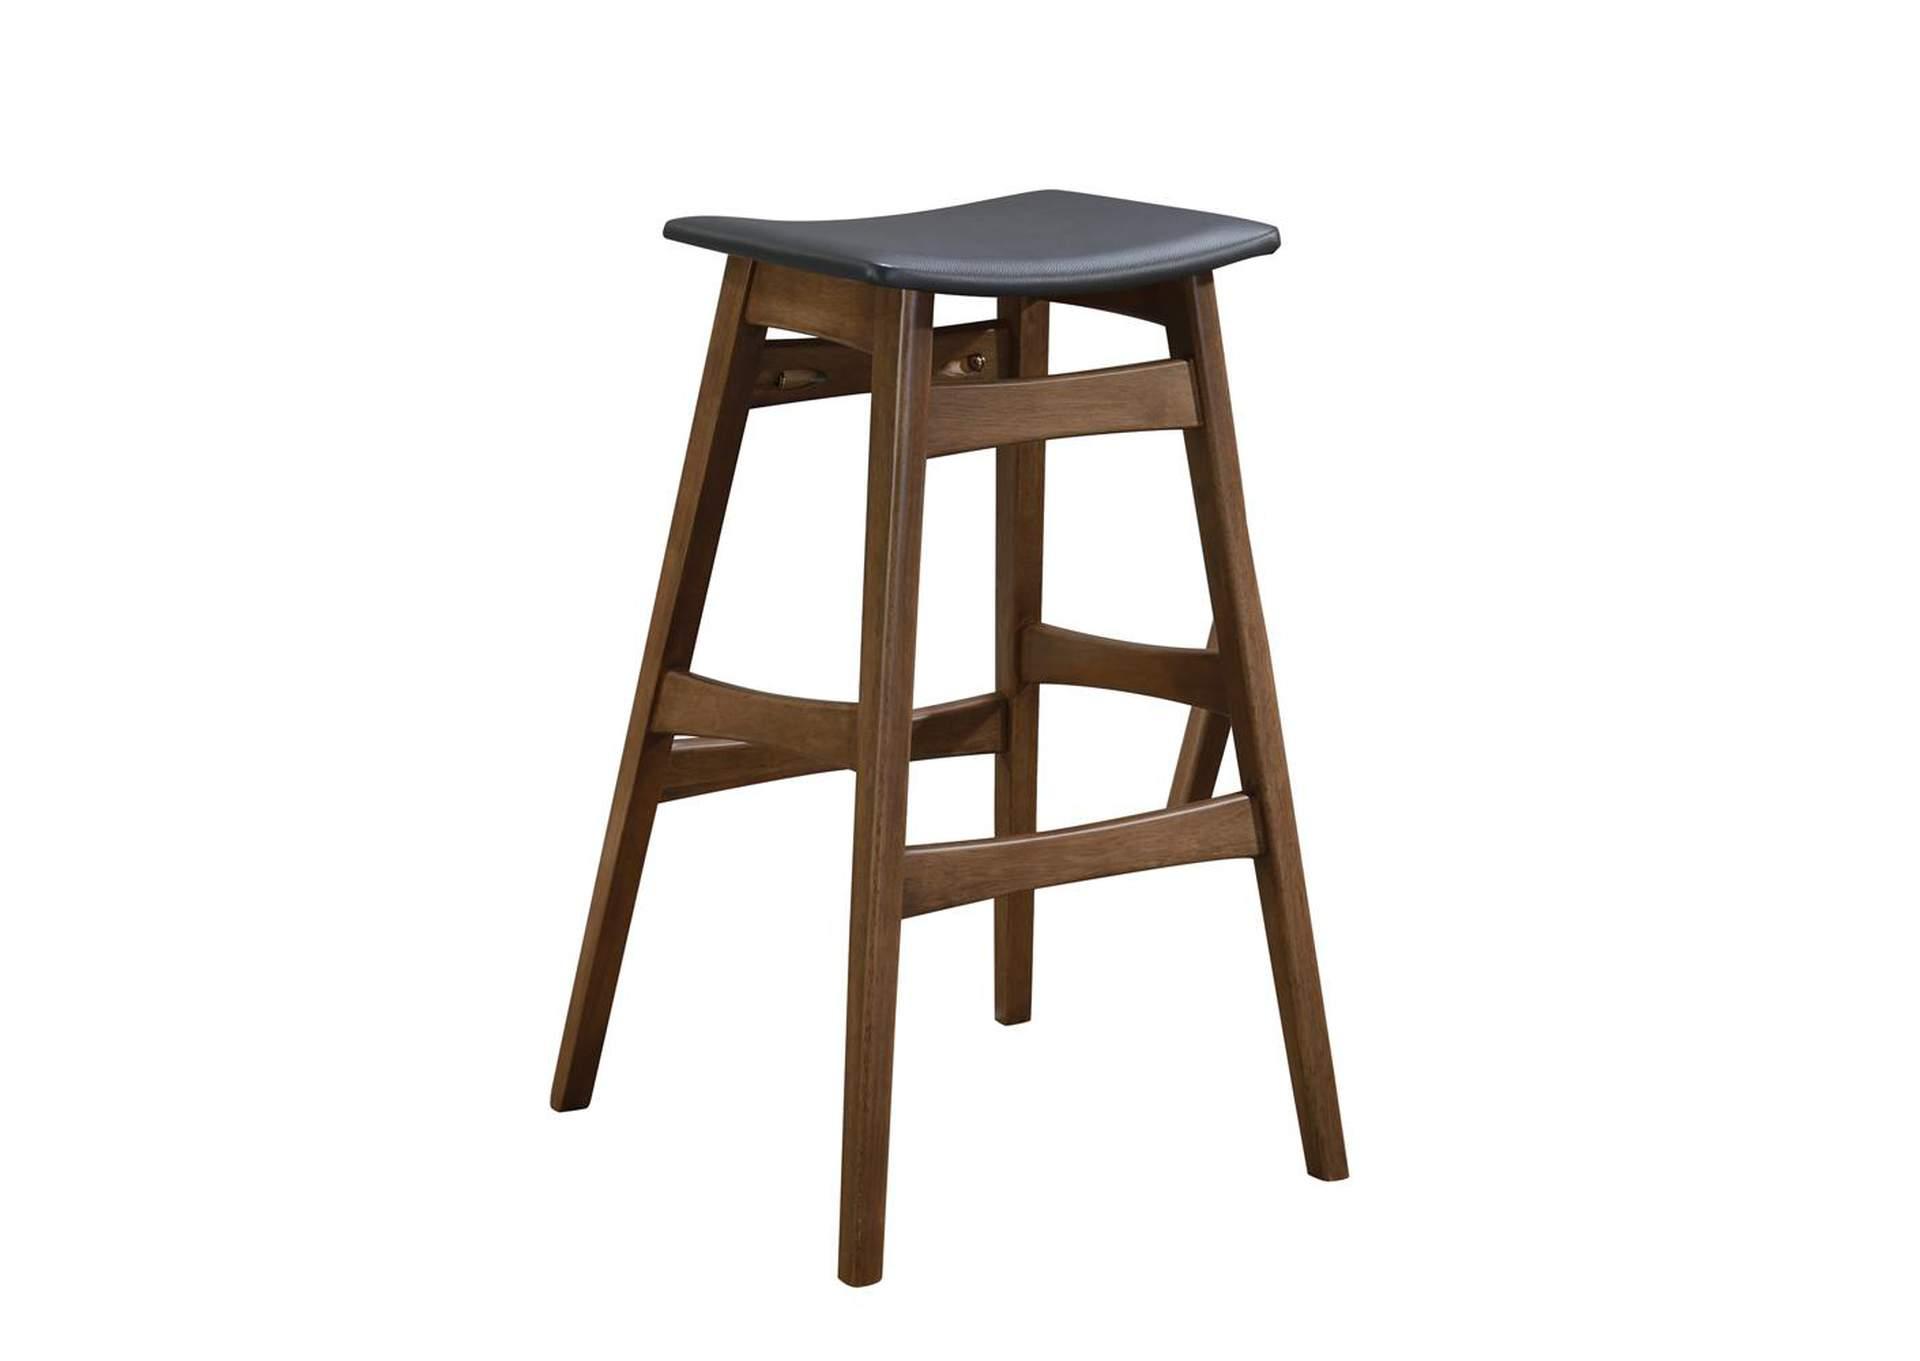 Tapered Legs Bar Stools Dark Grey And Walnut Set Of 2 Best Buy Furniture And Mattress